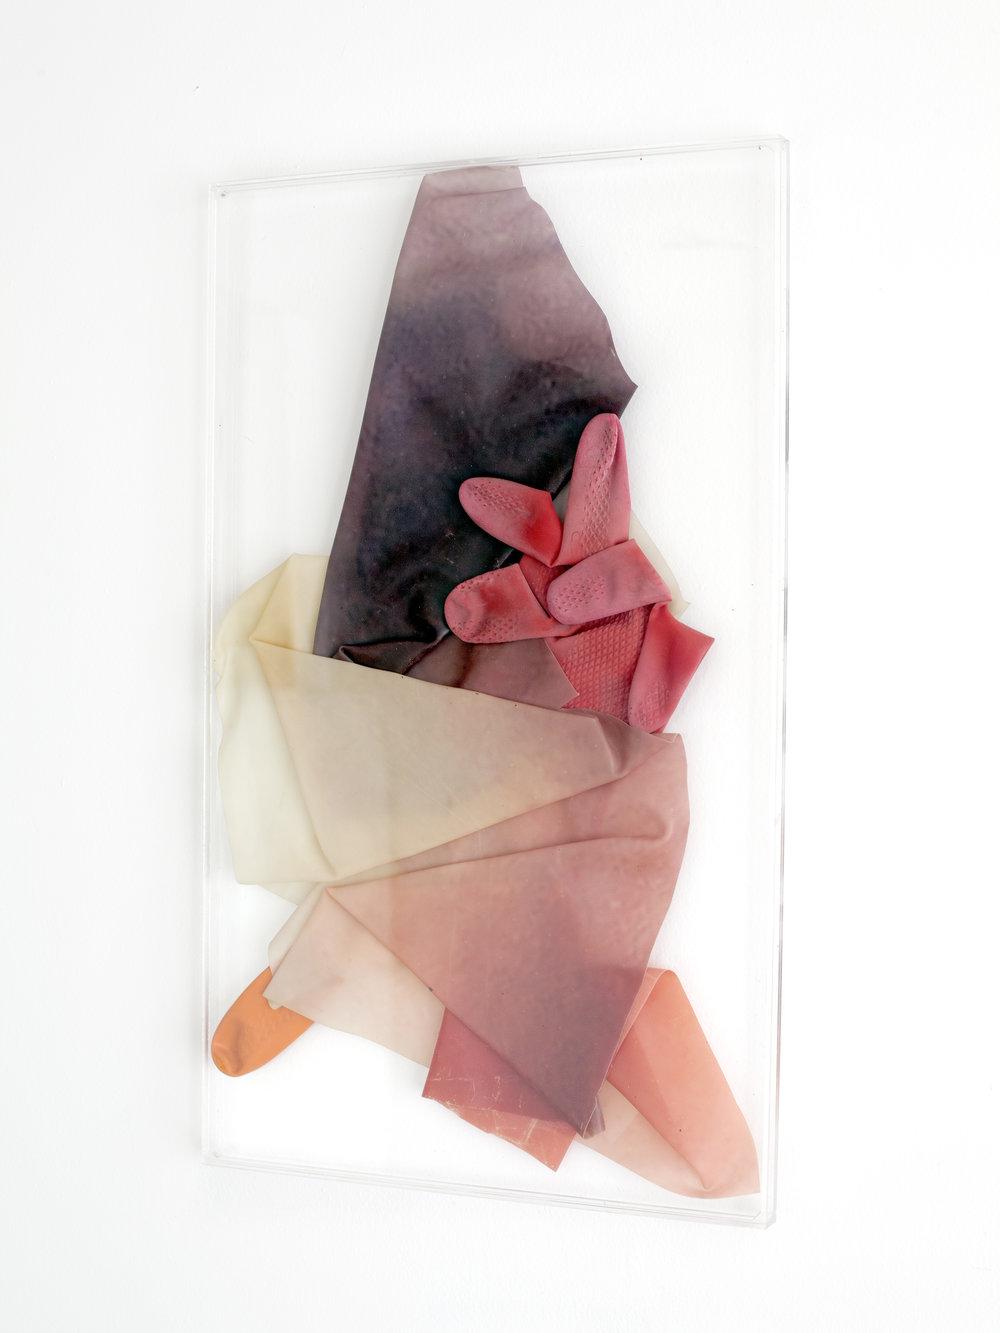 SALAAM, 2018, sculpture (unique), 50 X 30 X 1,6 cm, inkjetprint on latex, transparent acrylic, rubber gloves